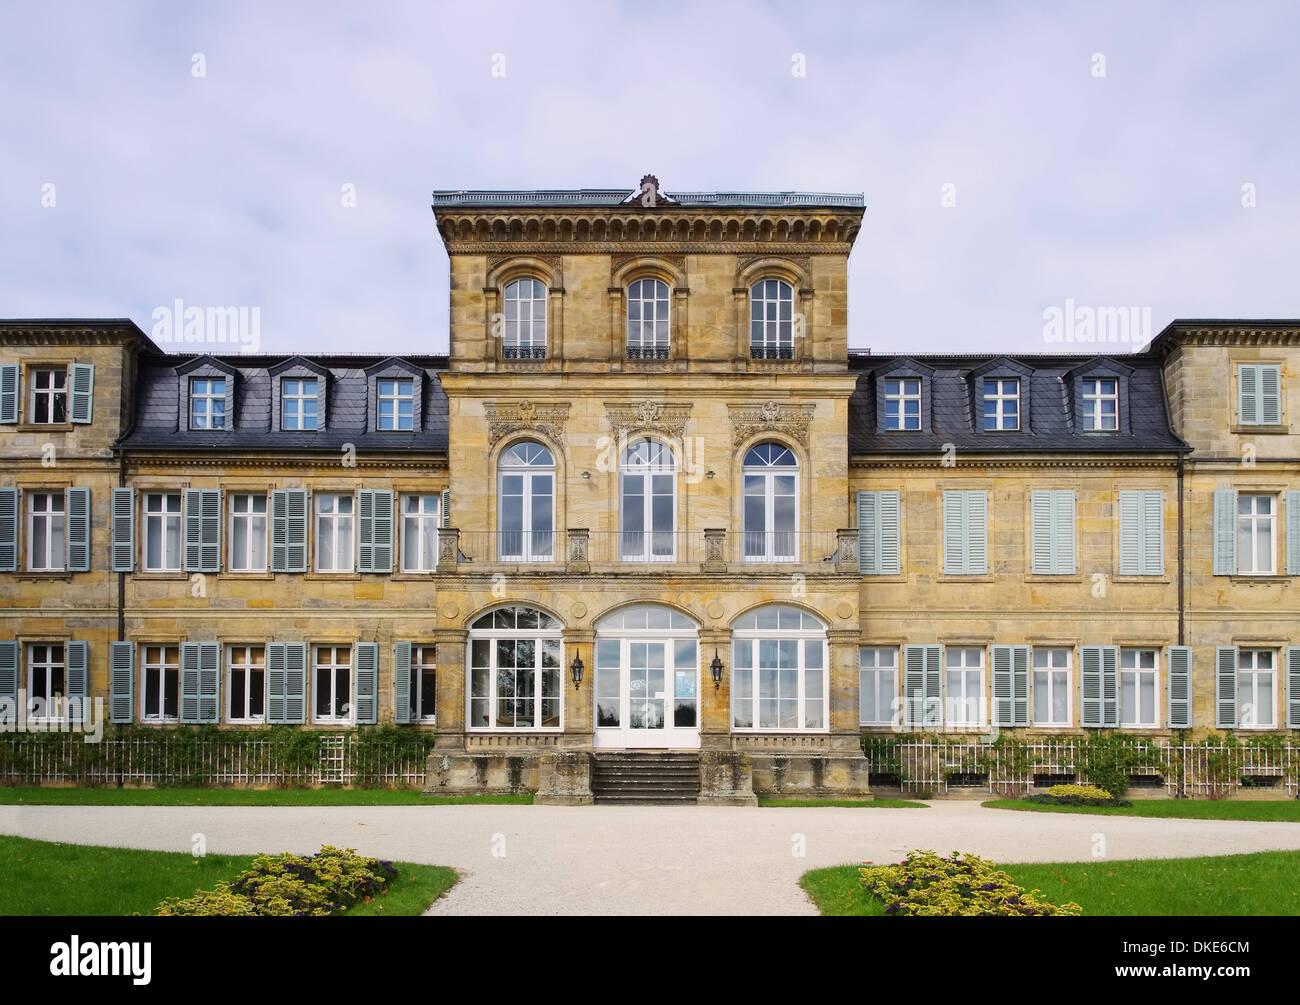 Bayreuth Schloss Fantaisie - Bayreuth Palace Fantaisie 08 - Stock Image